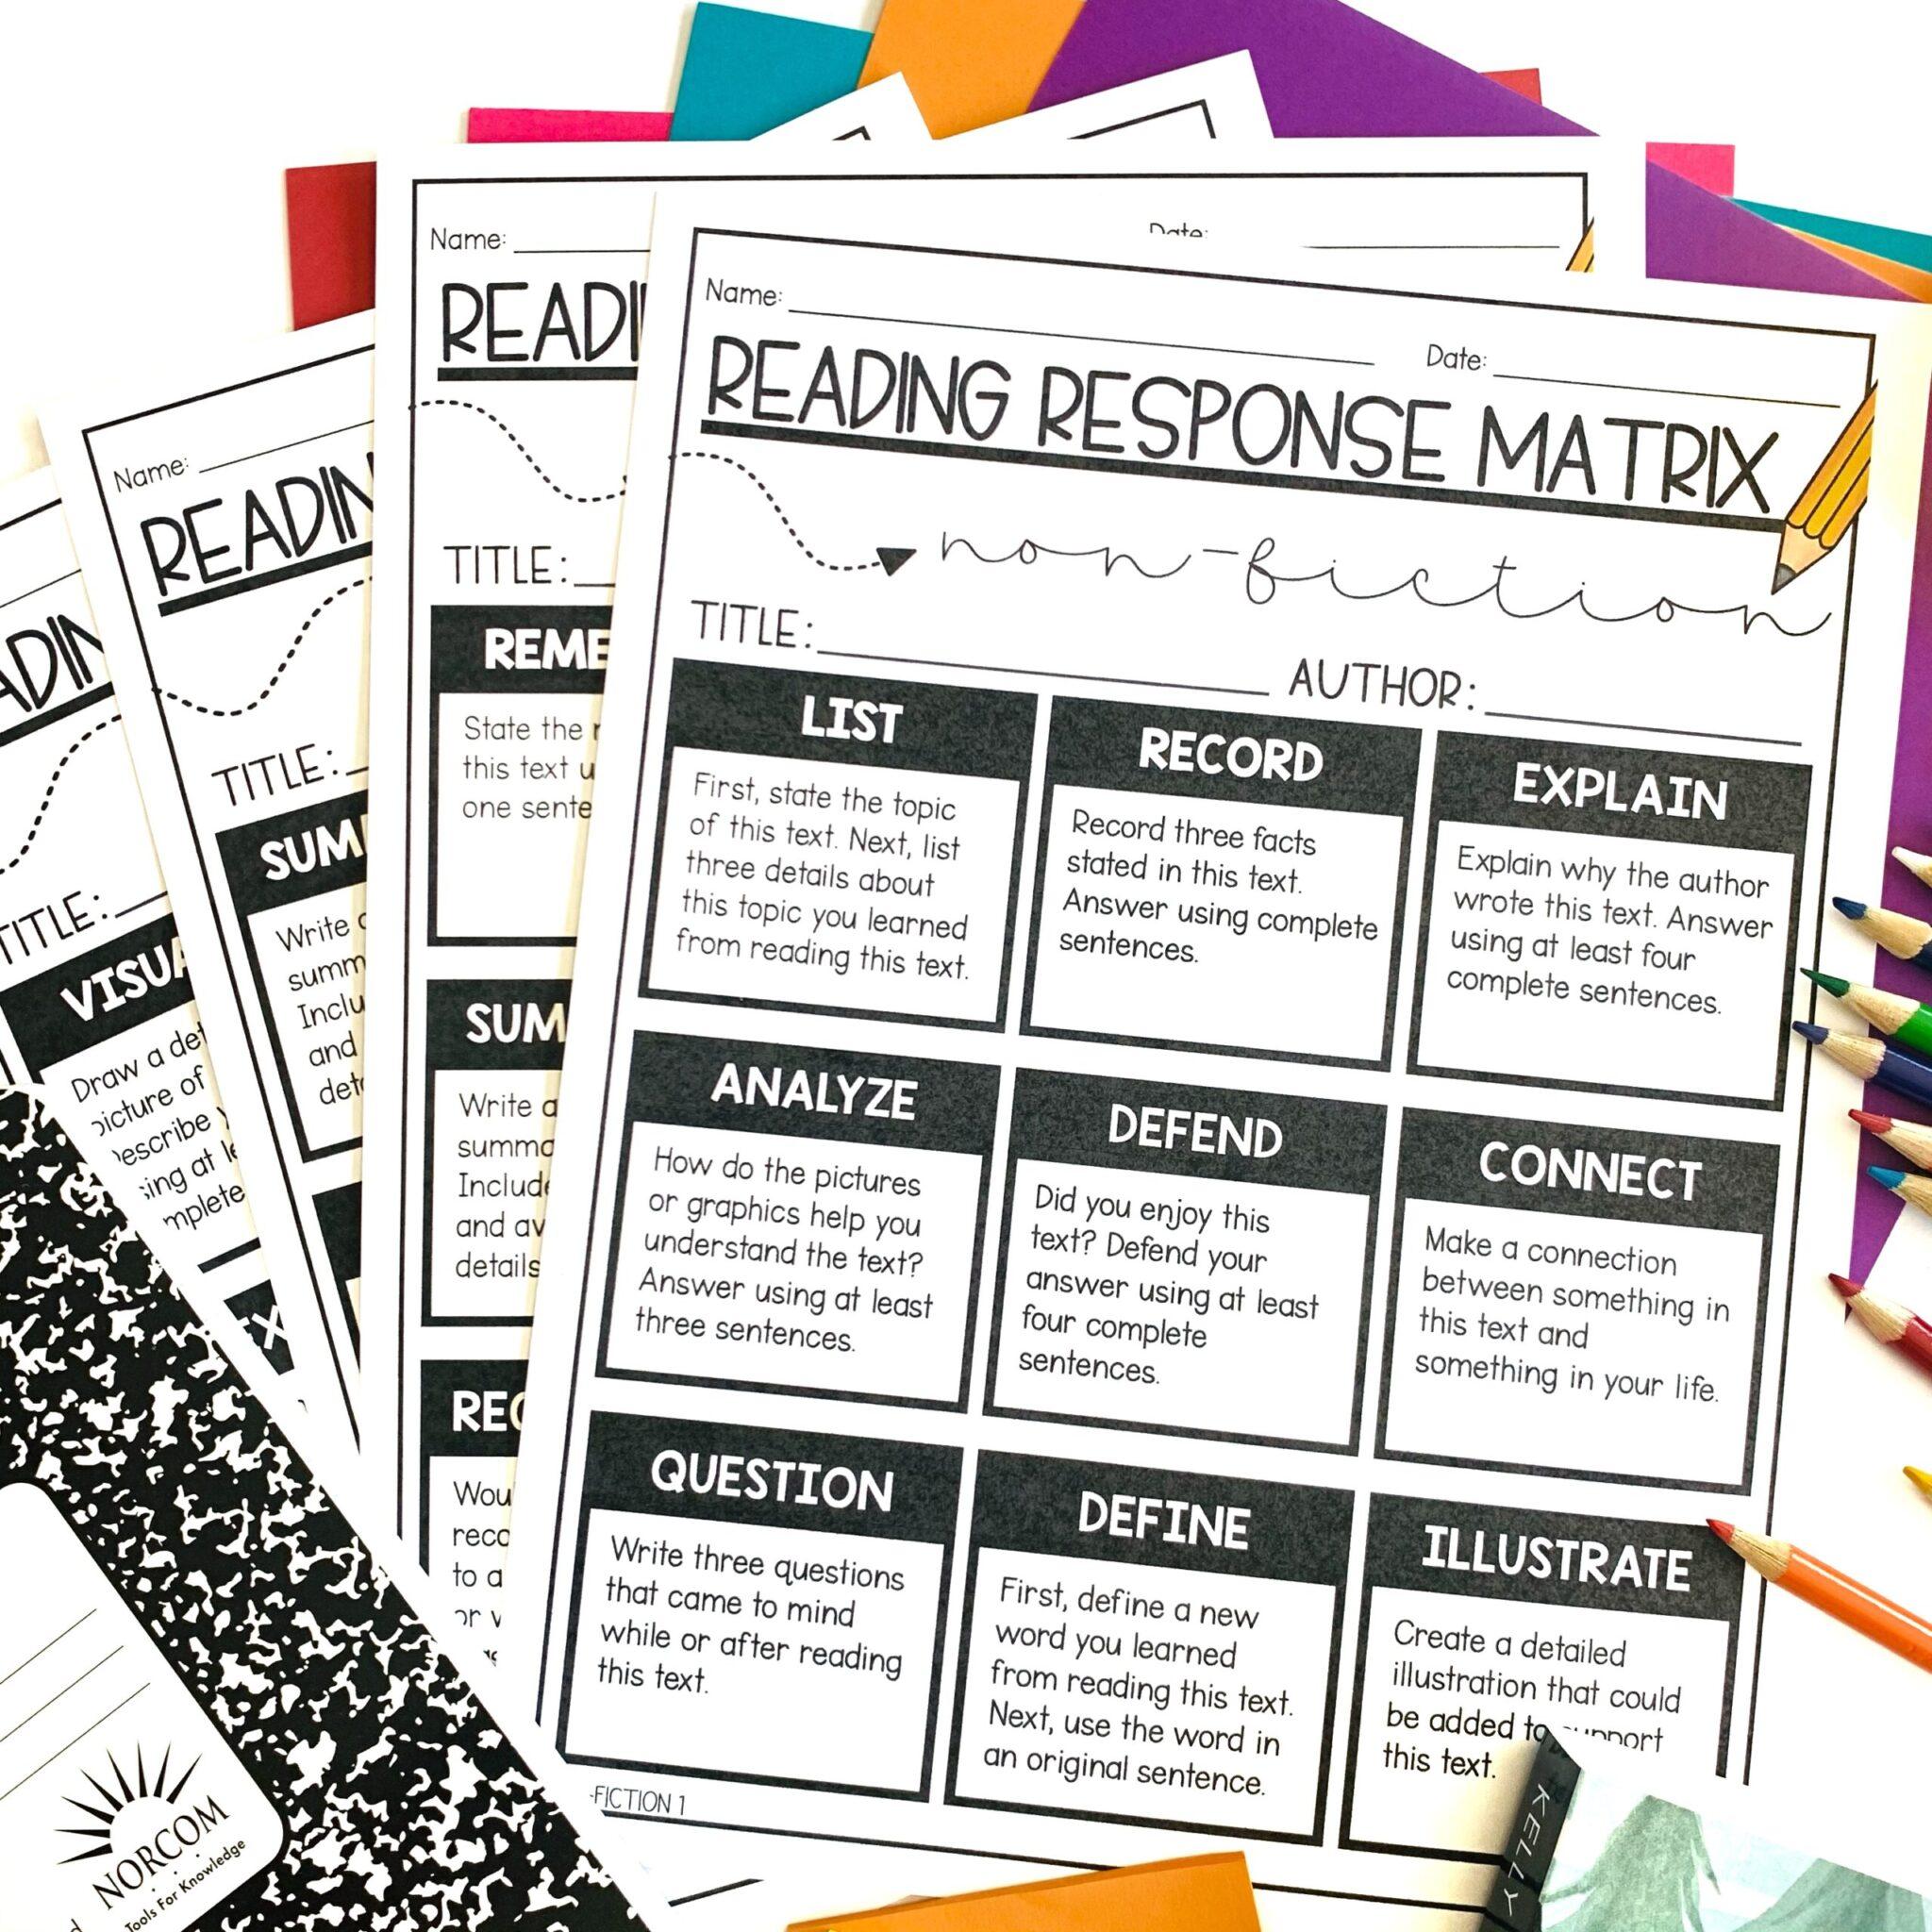 editable, printable, digital student choice boards